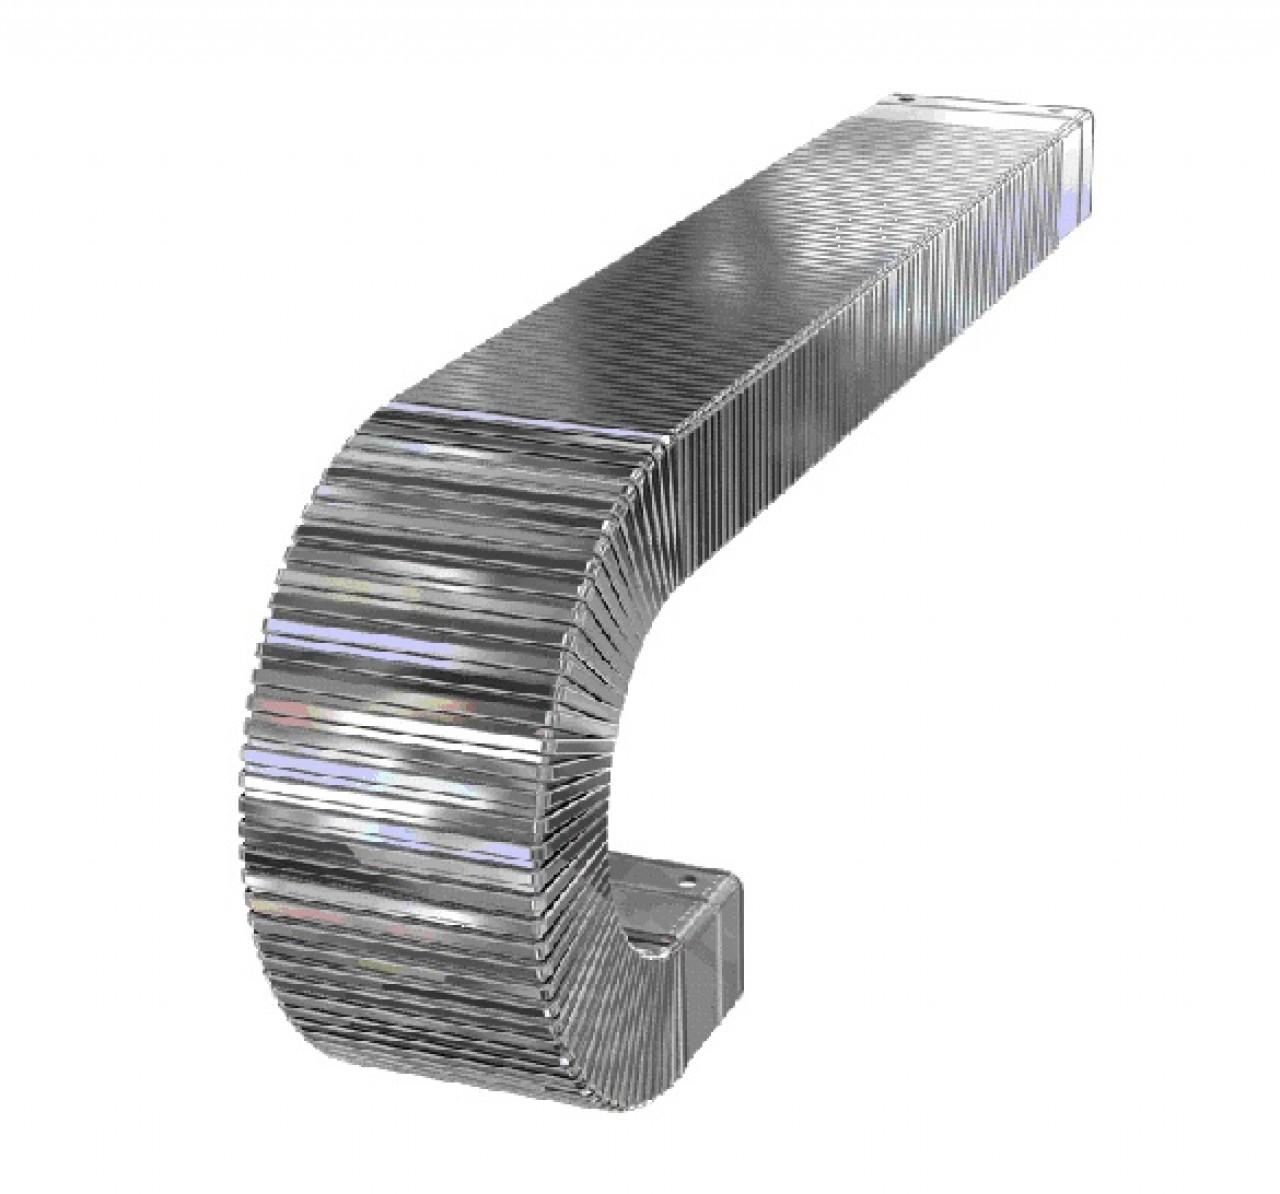 EKD uzavreté energetické reťaze SFK – steel cube